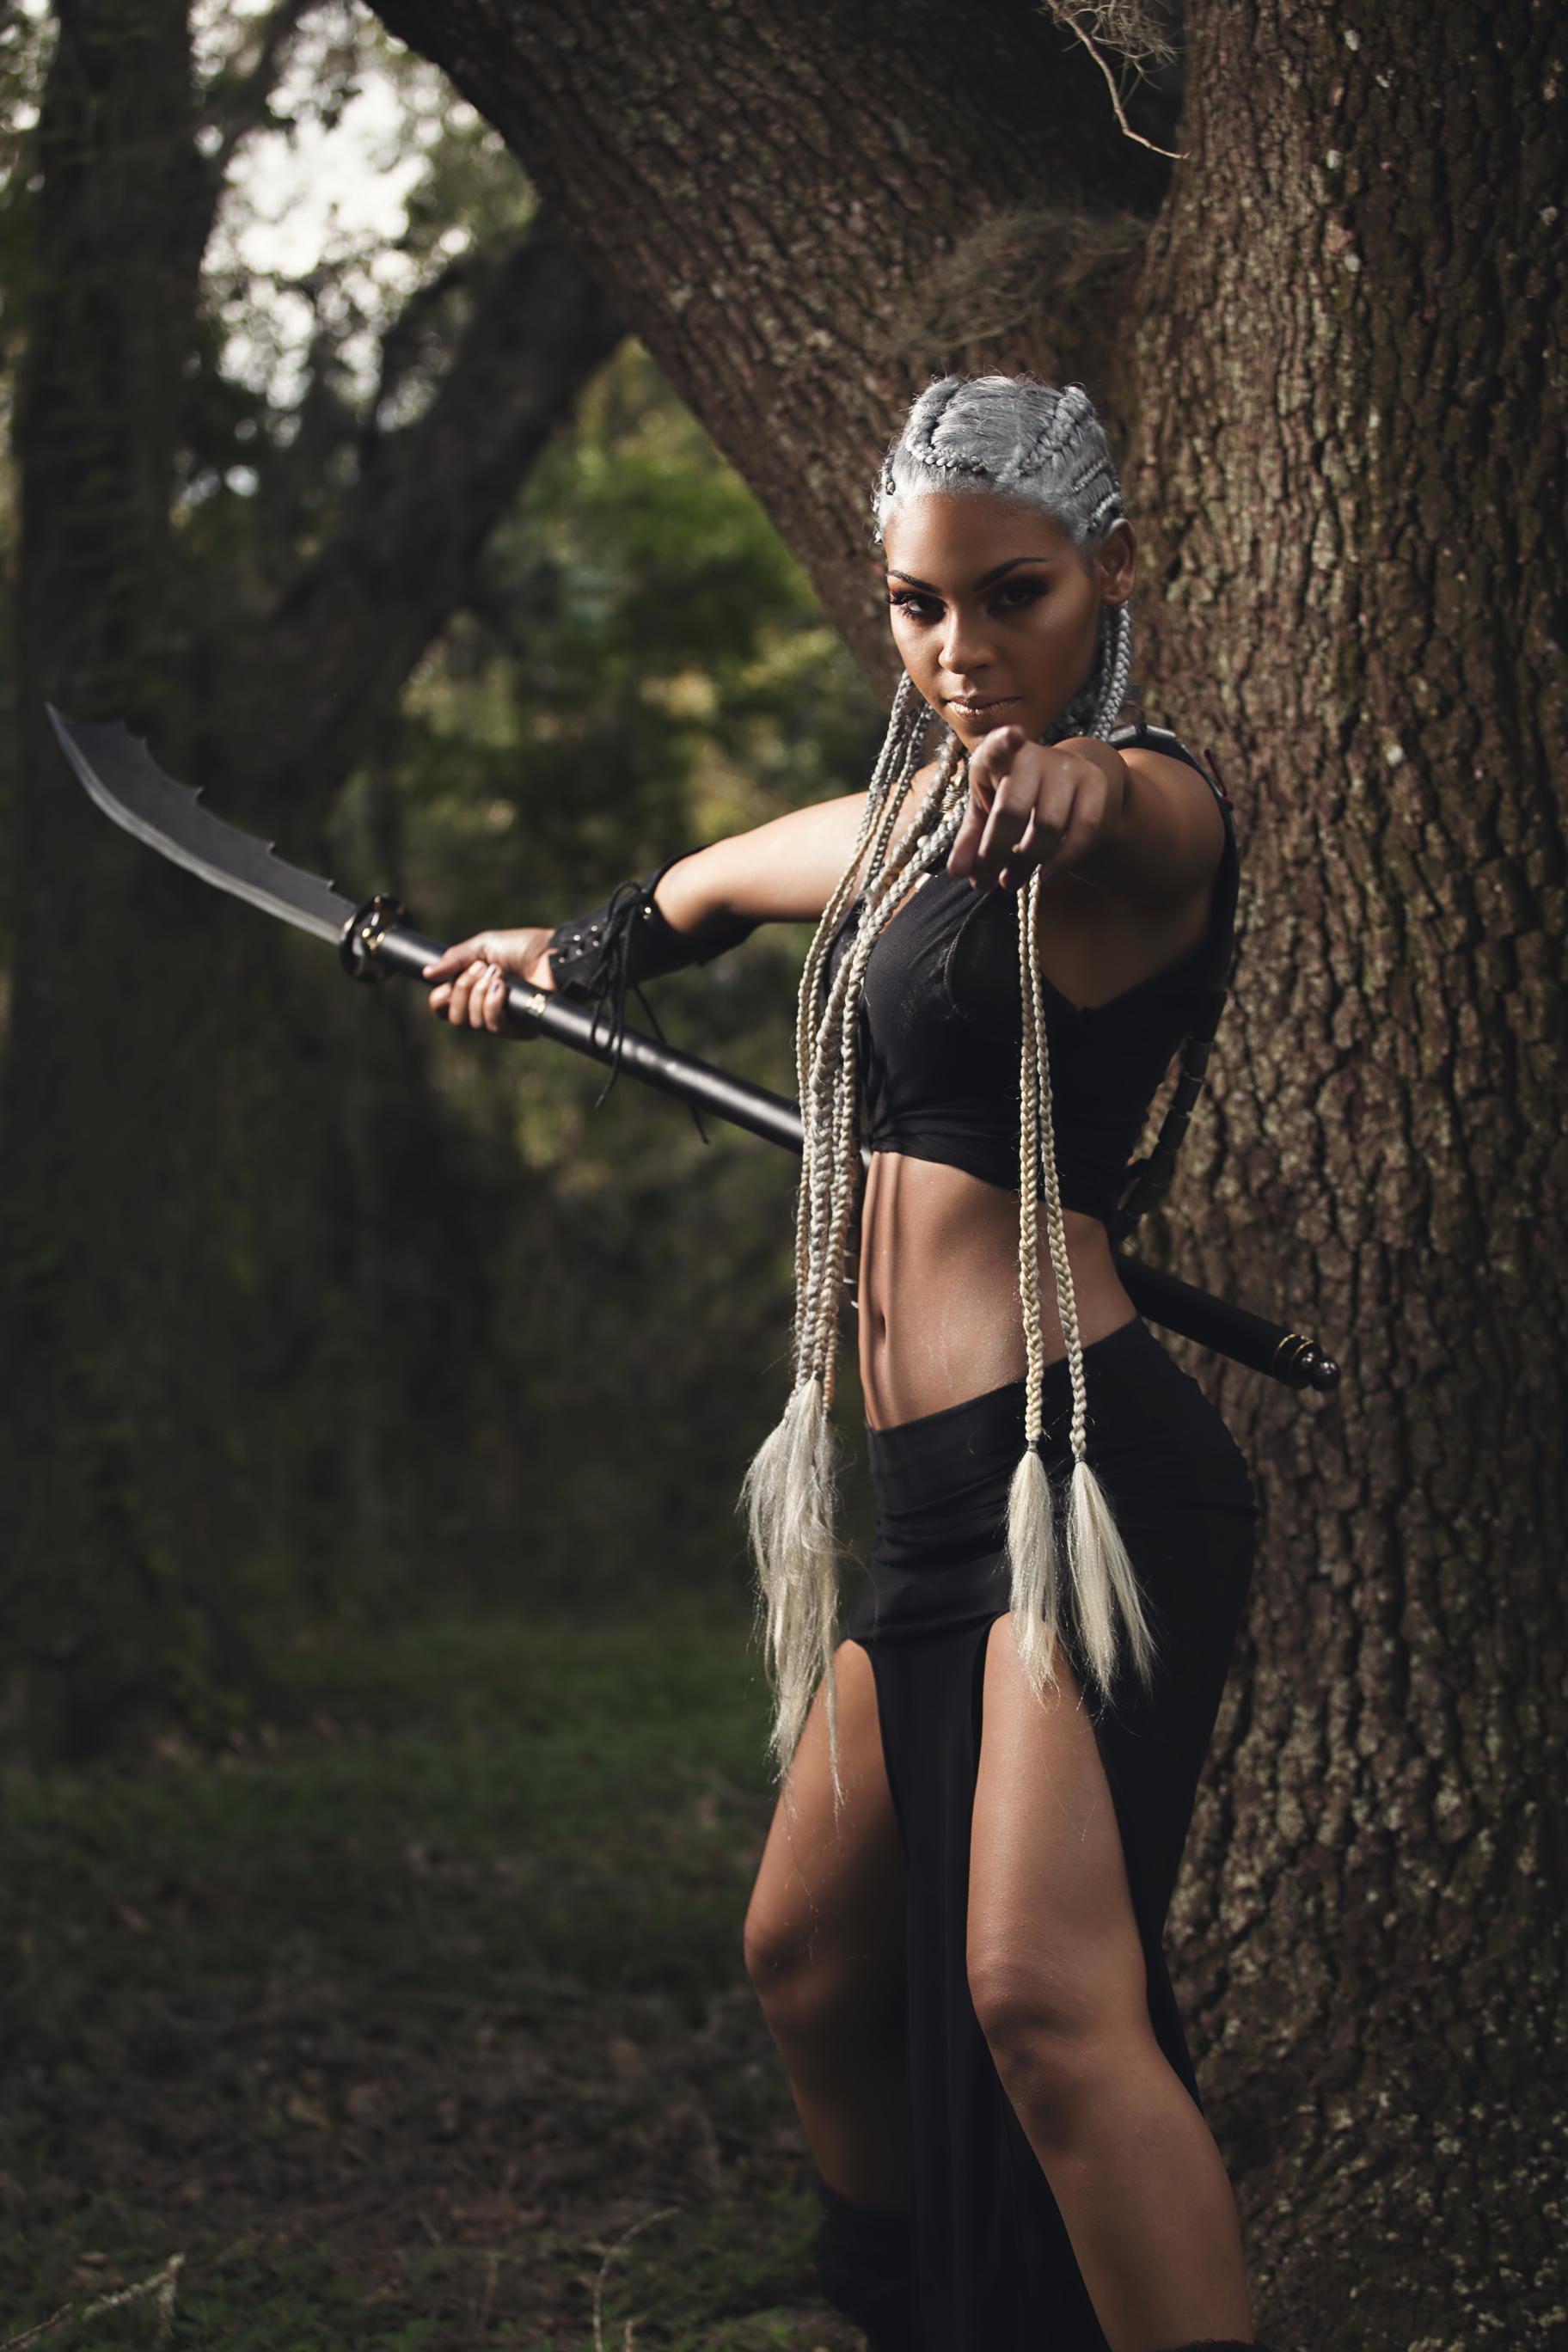 character-chamber-photography-warrior-female13.jpg